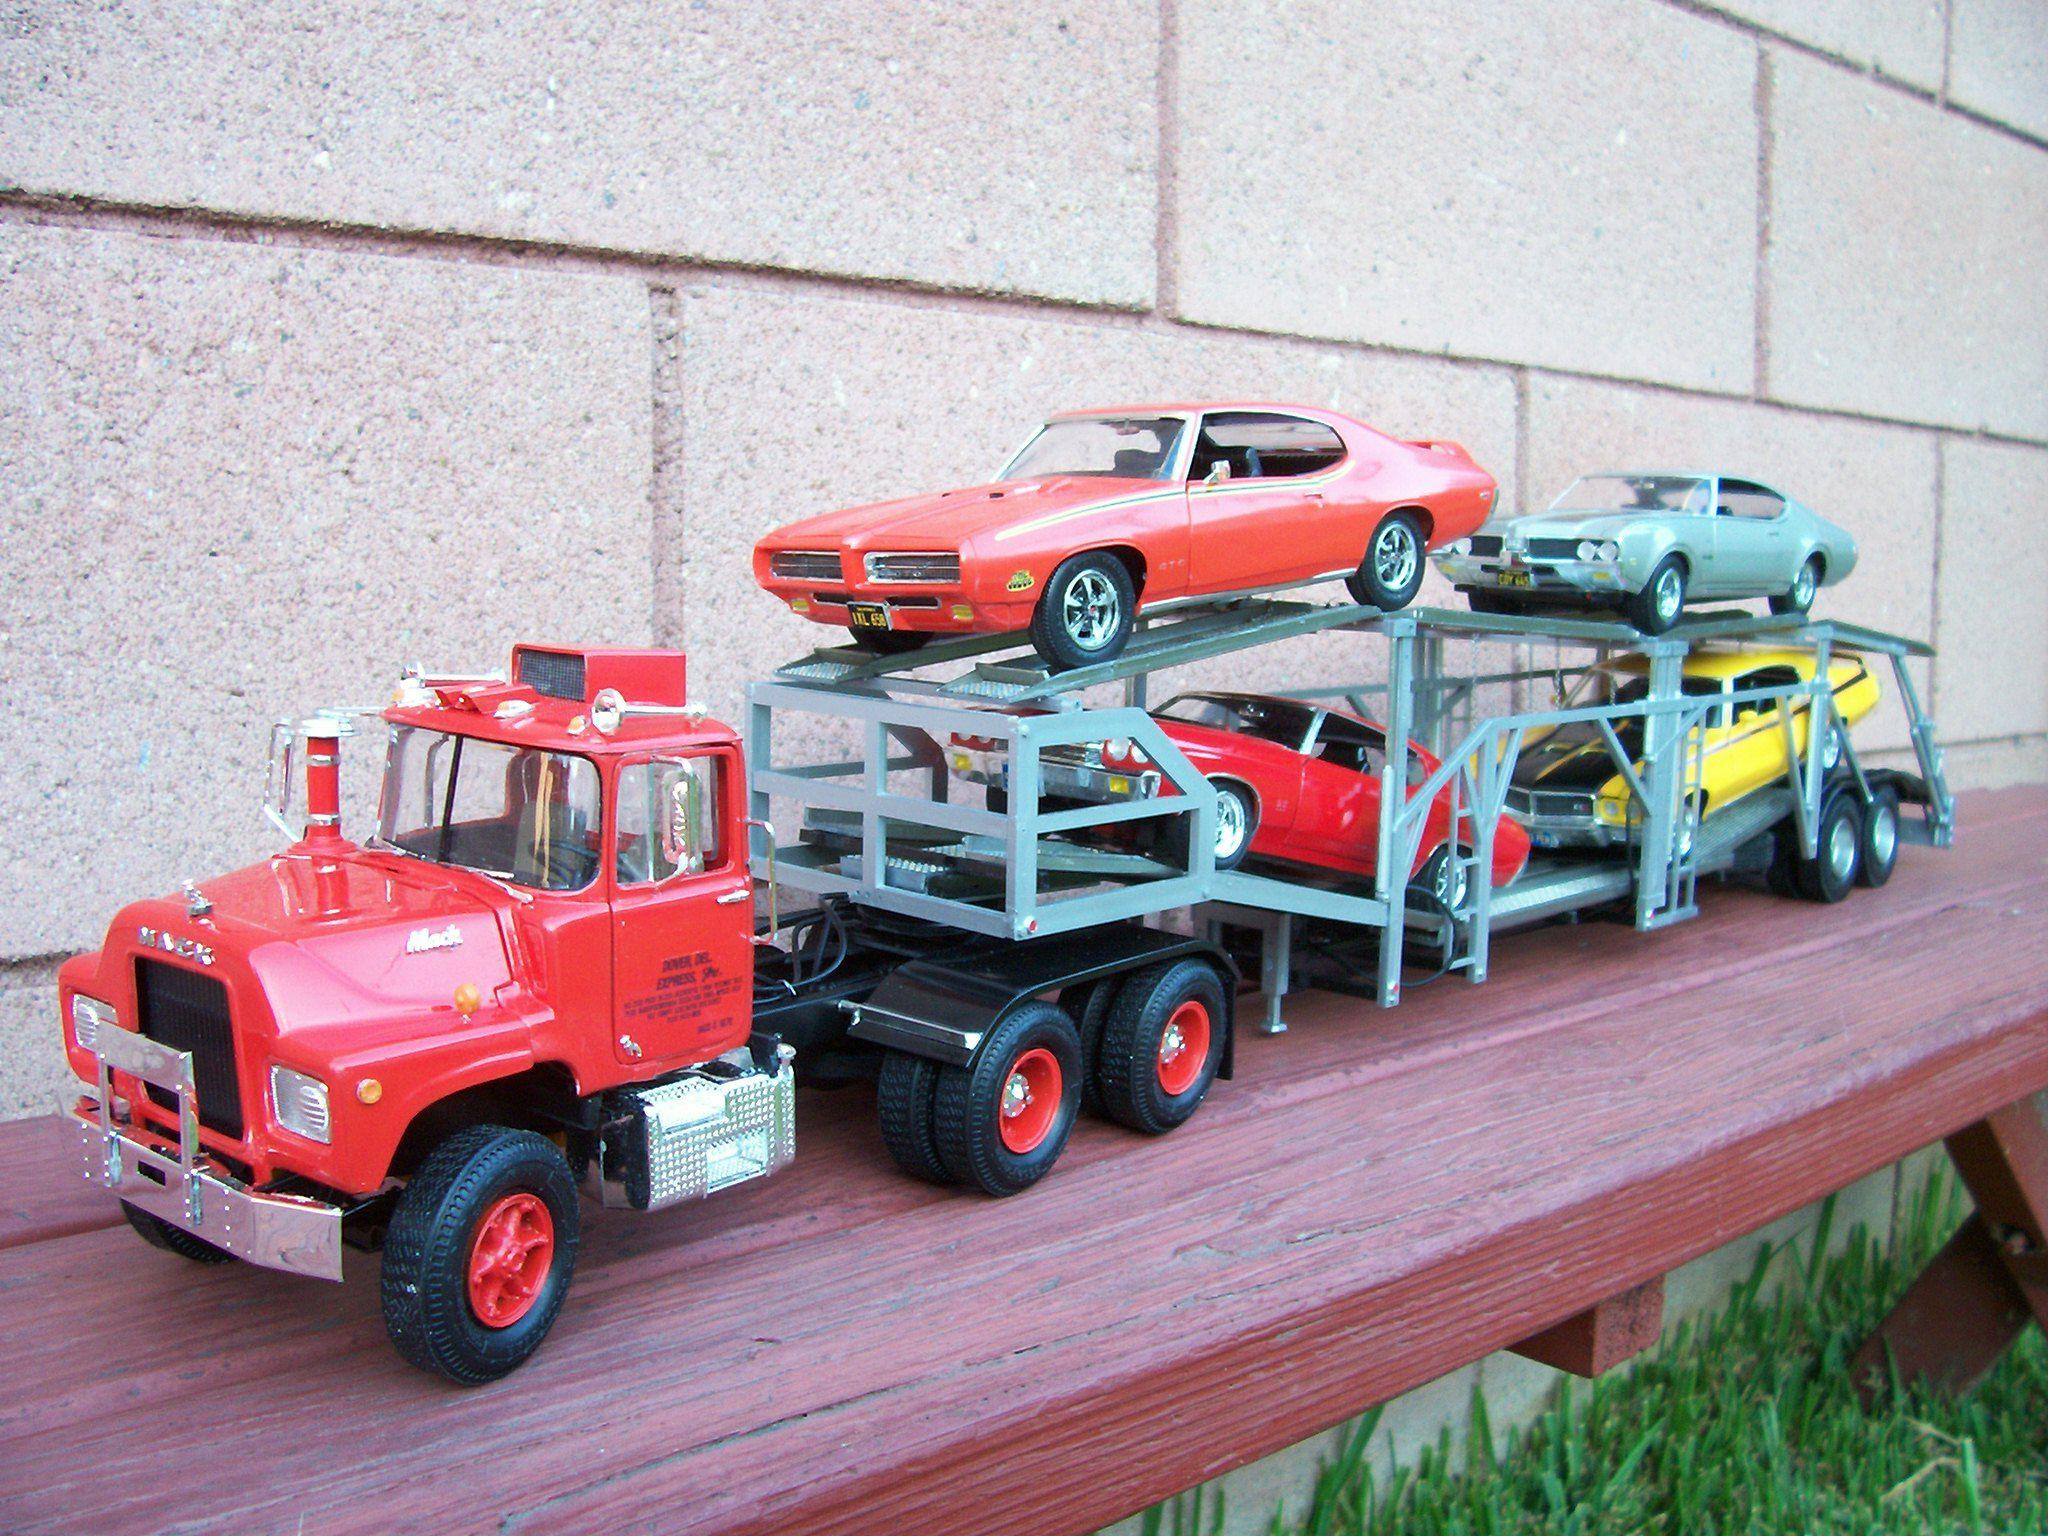 Mack Trucks Automatic : Mack truck with auto transport trailer car scale